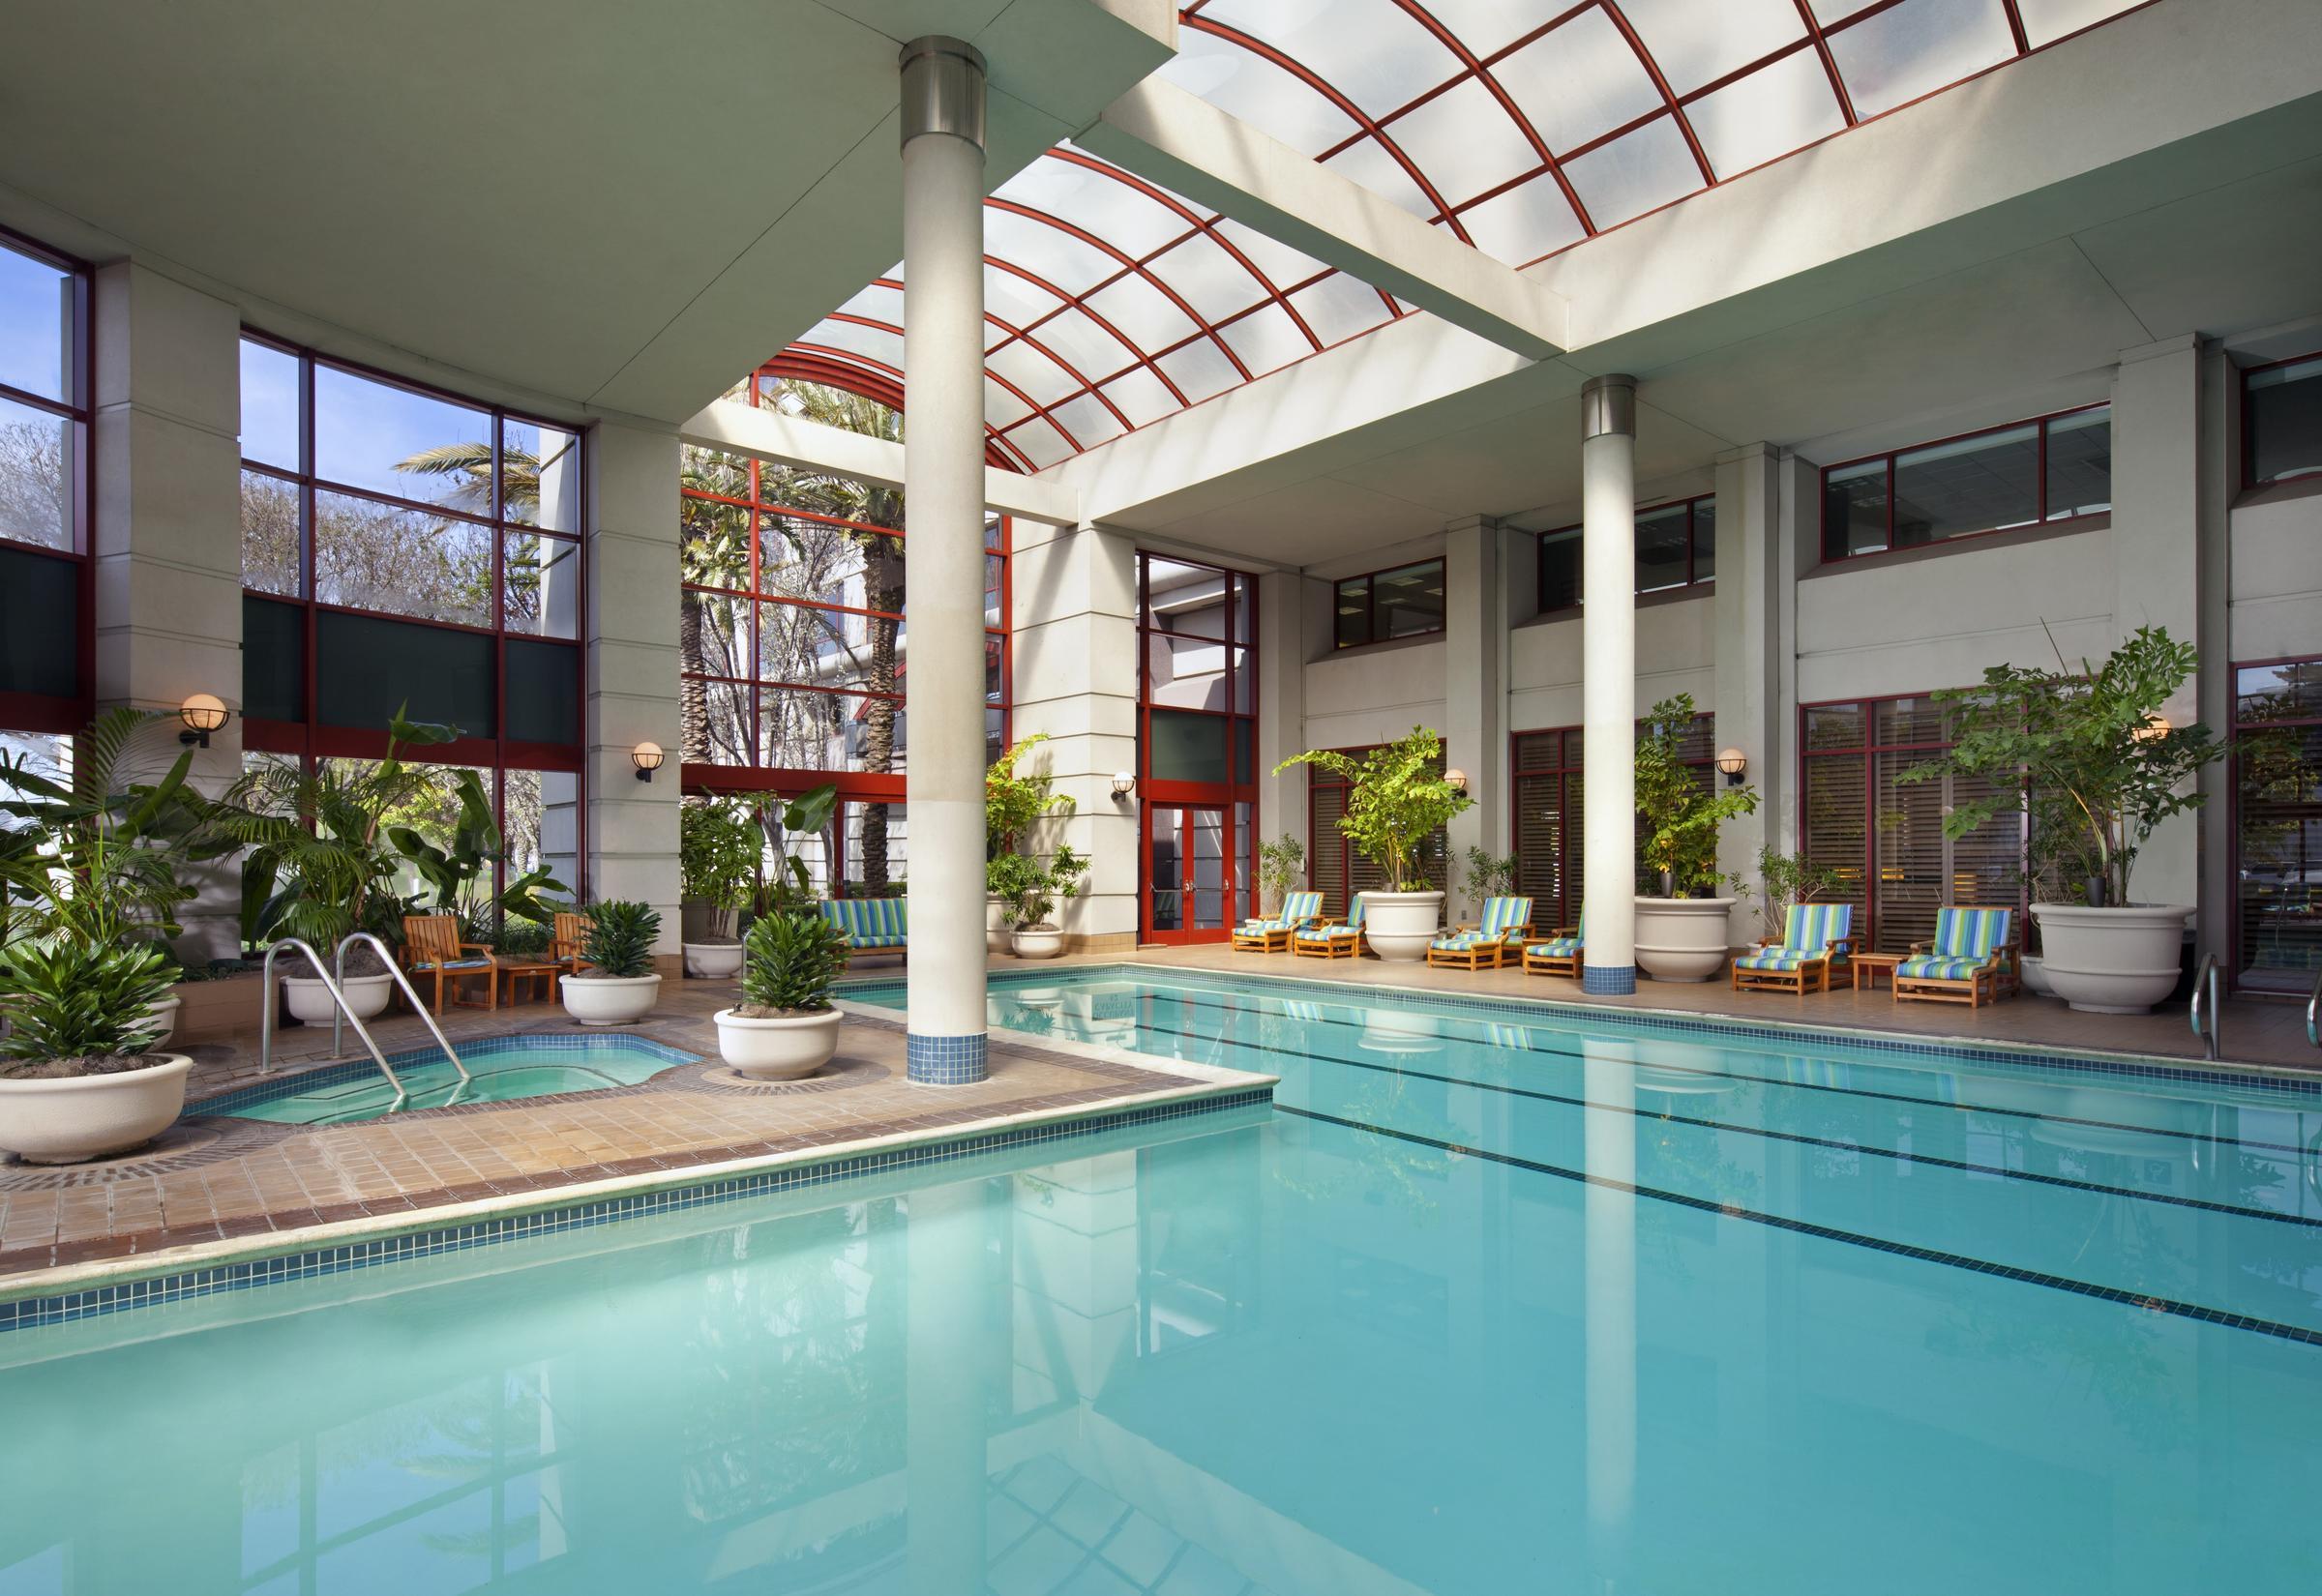 Westin San Francisco Airport Indoor Pool